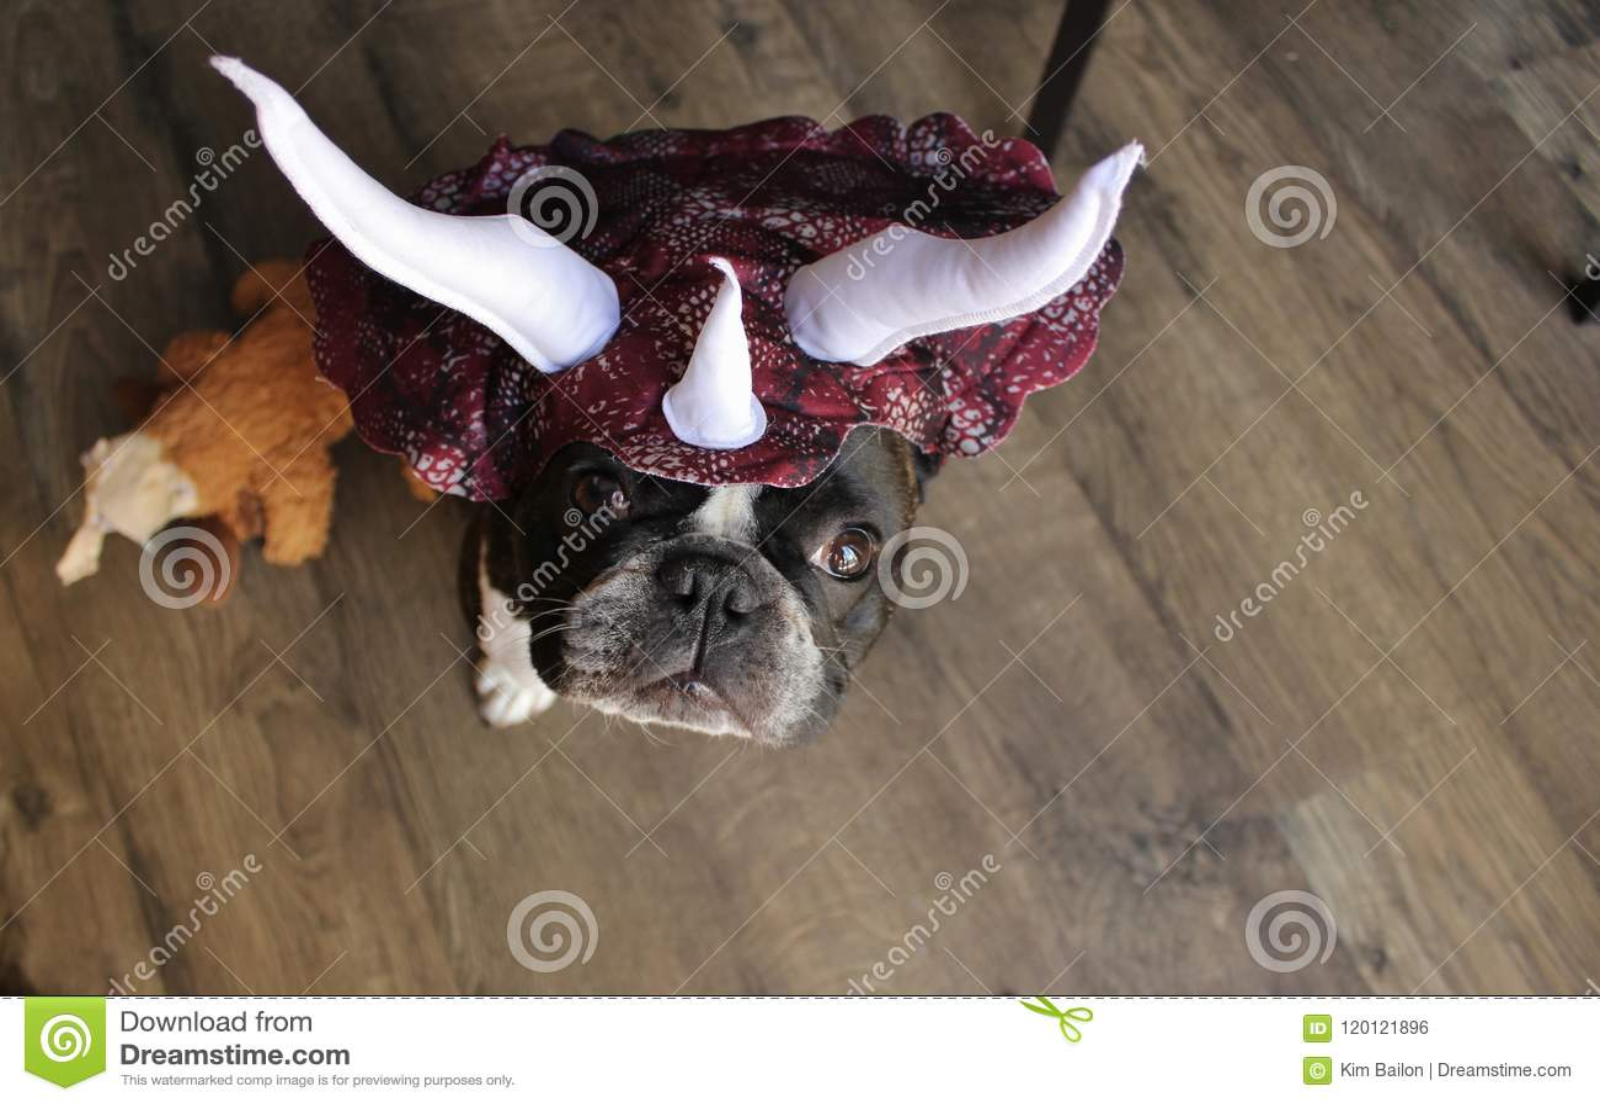 Bouledogue français comme Stegosaurus